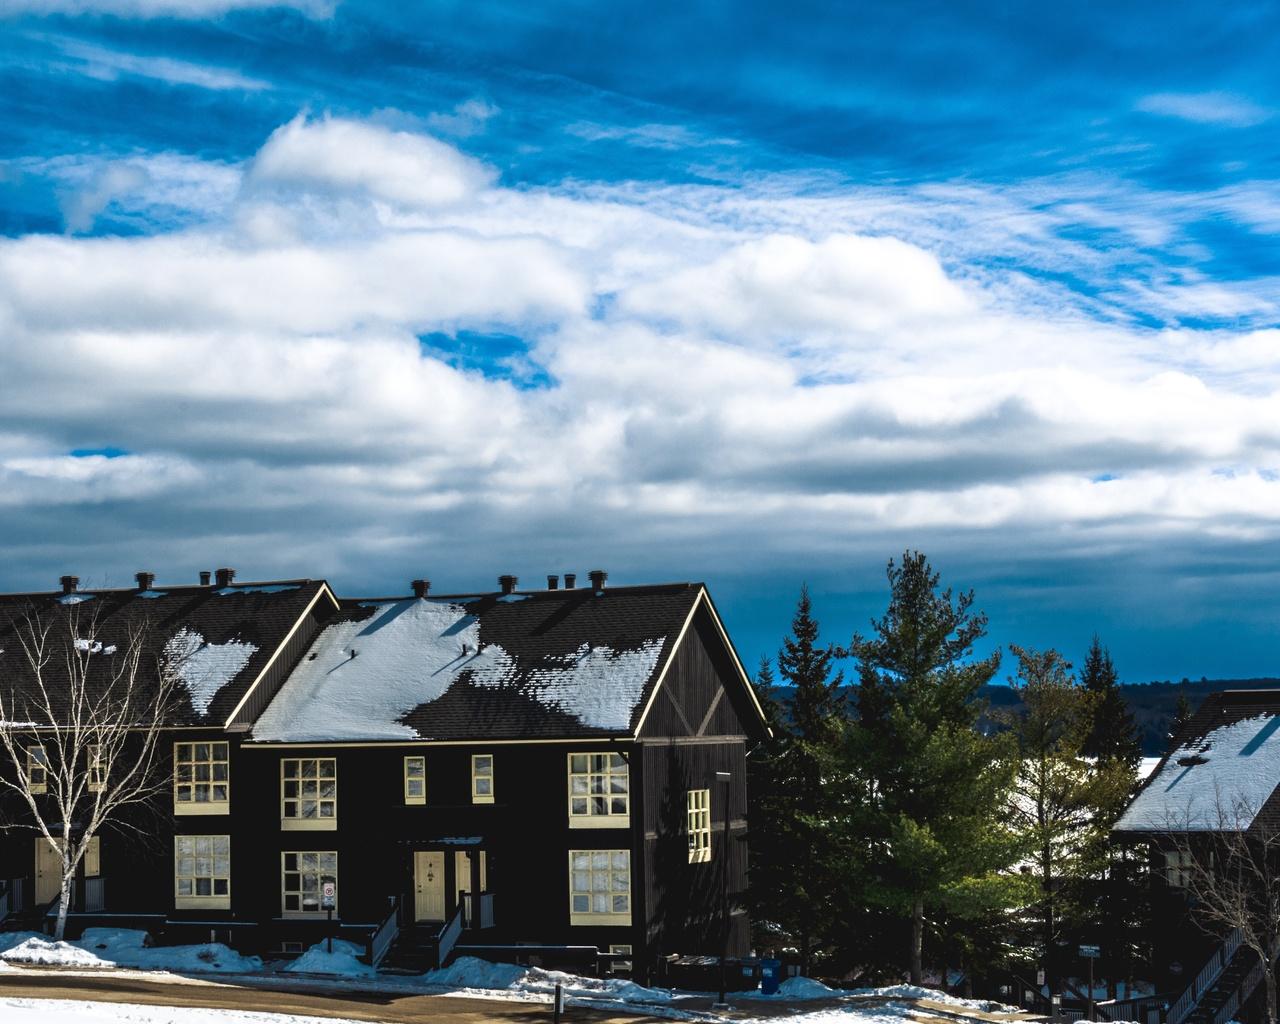 небо, облака, дома, снег, зима